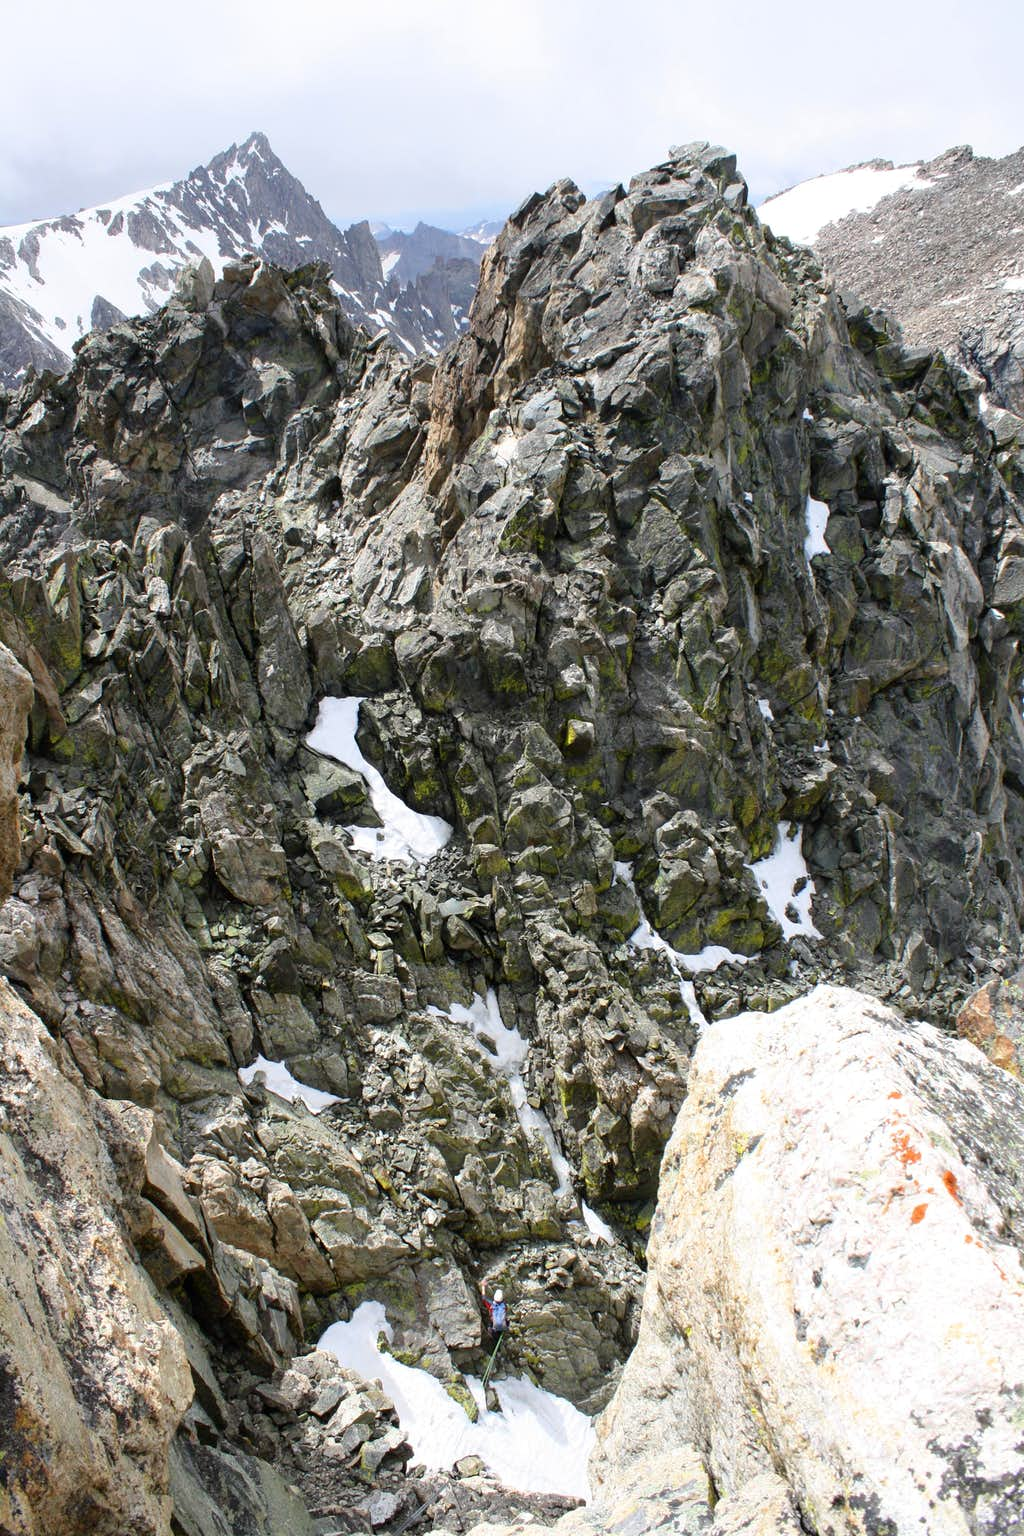 Turret Peak's Southern Summit